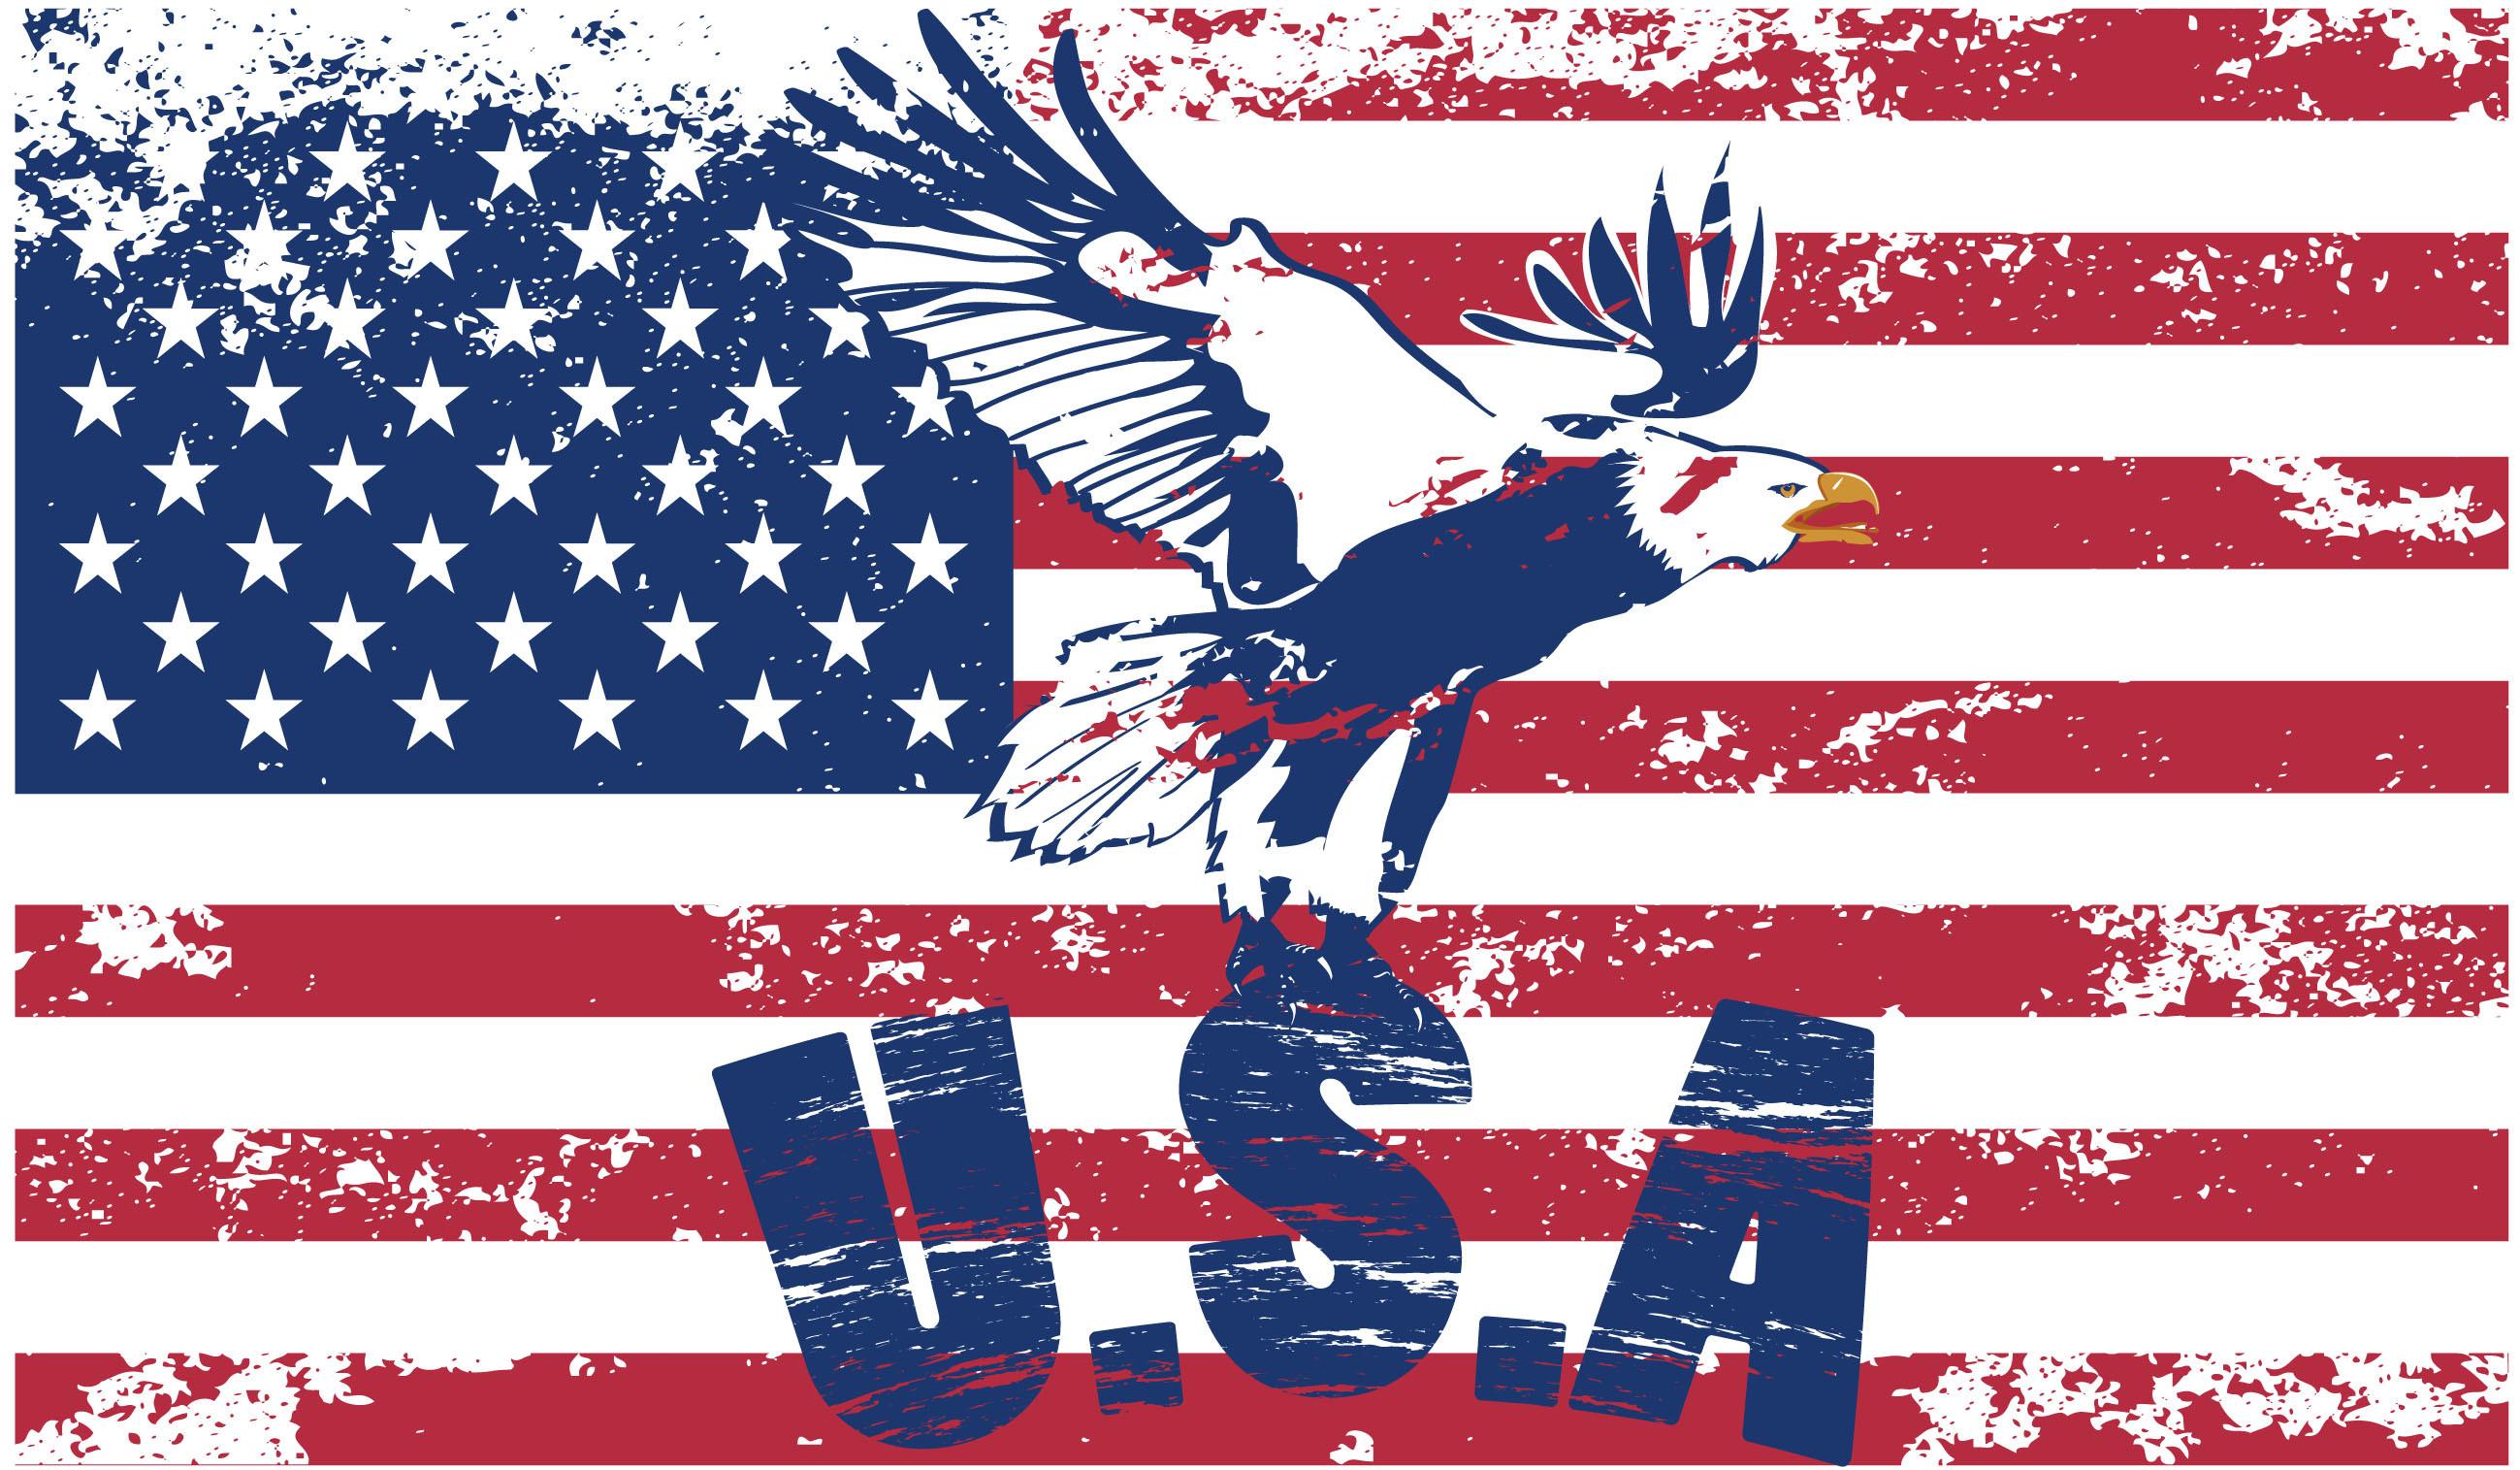 3d Wallpapers Desktop Free Download Animation Windows 7 American Flag Background Images 61 Images